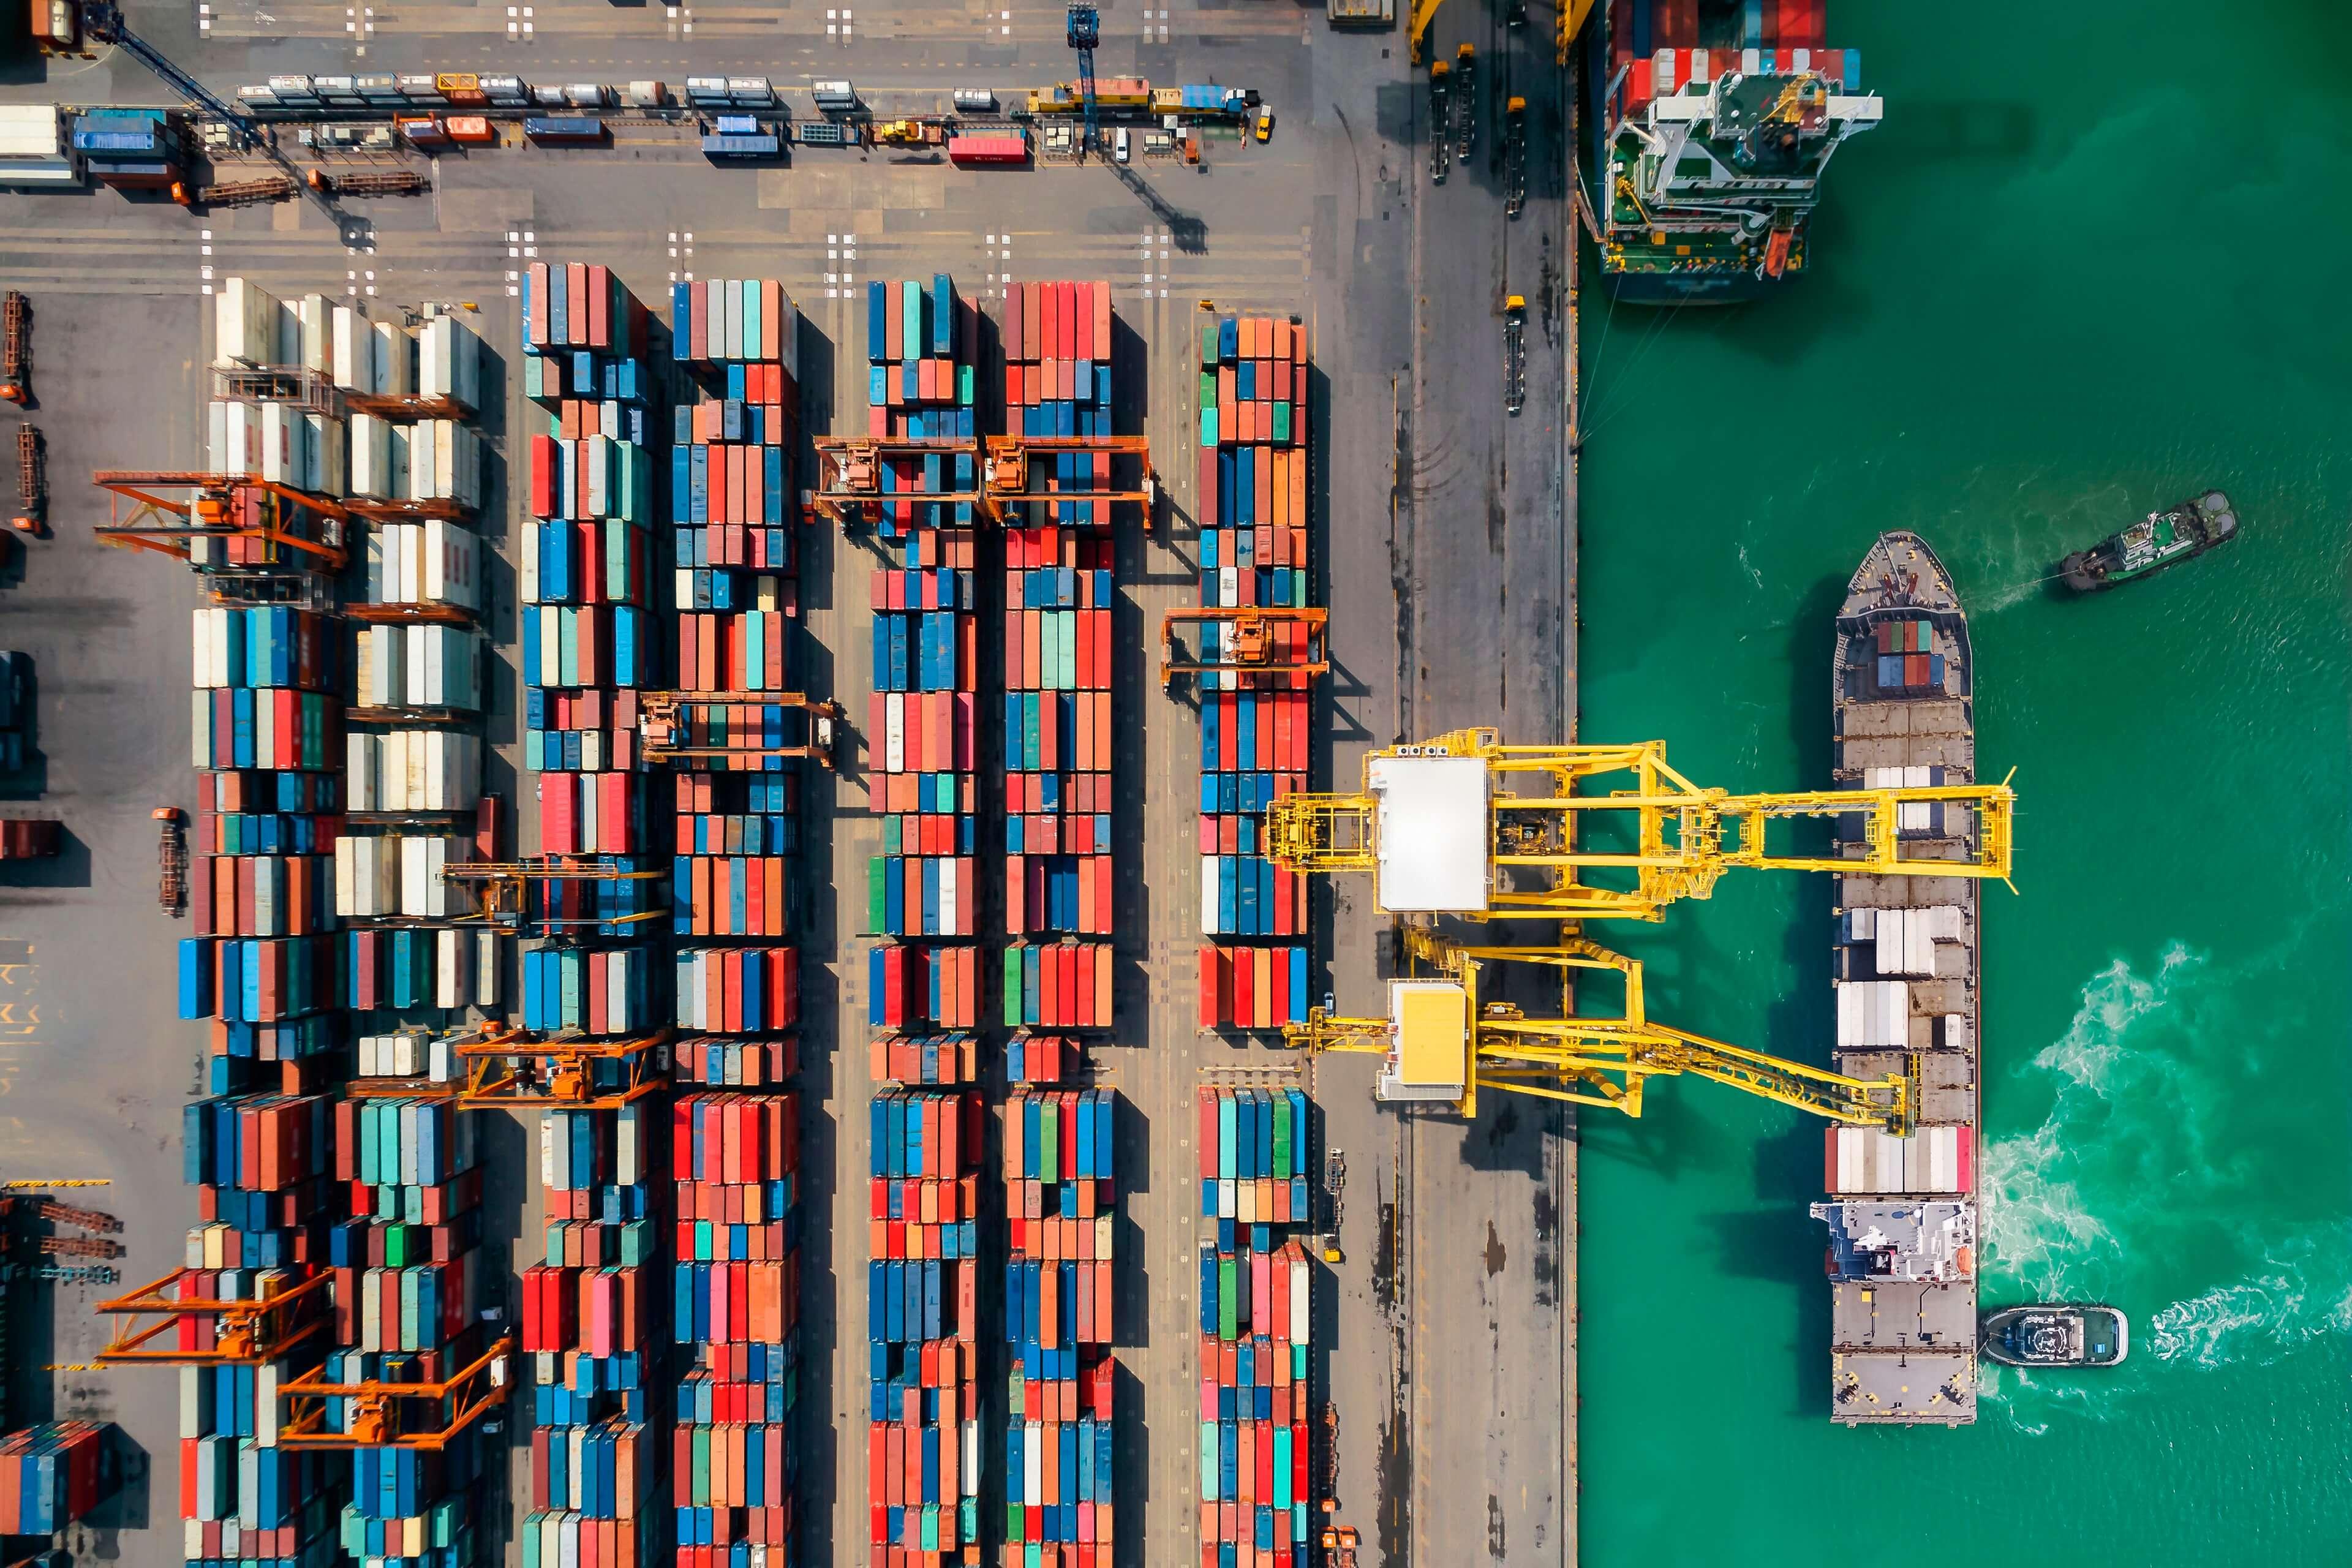 Shipping yard image